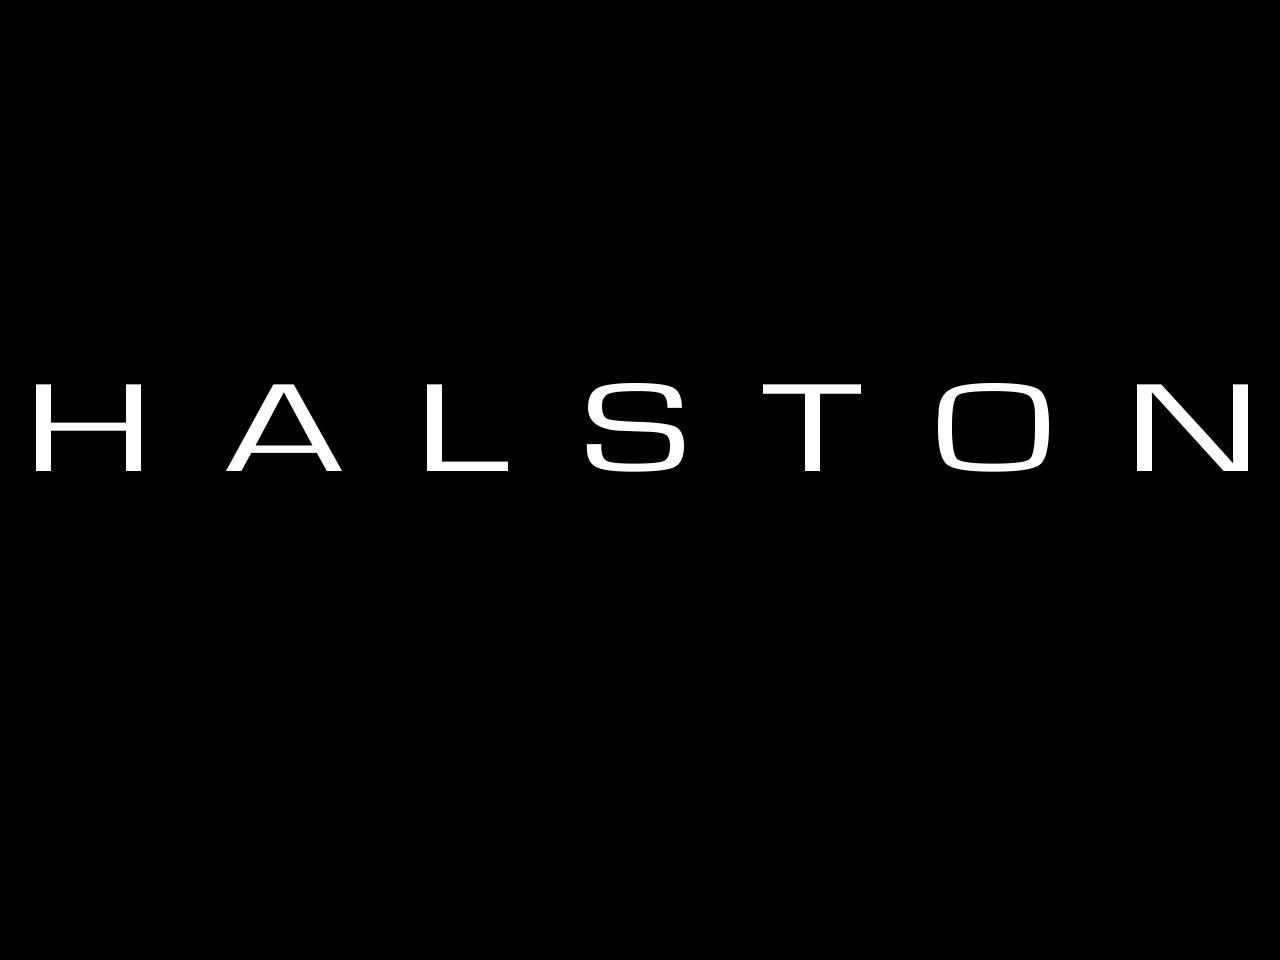 HALSTON logo.png